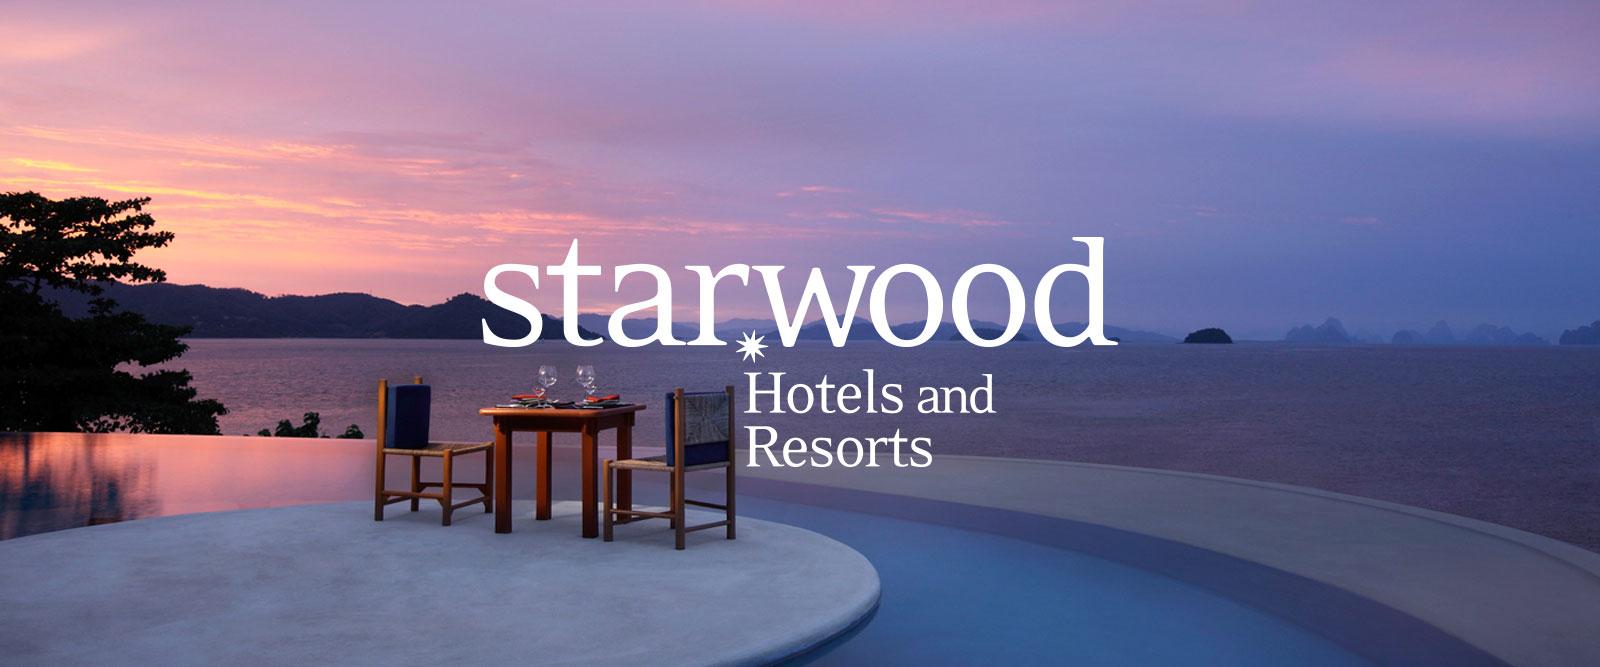 Starwood Hotels & Resorts Logos - Starwood Hotels California Map